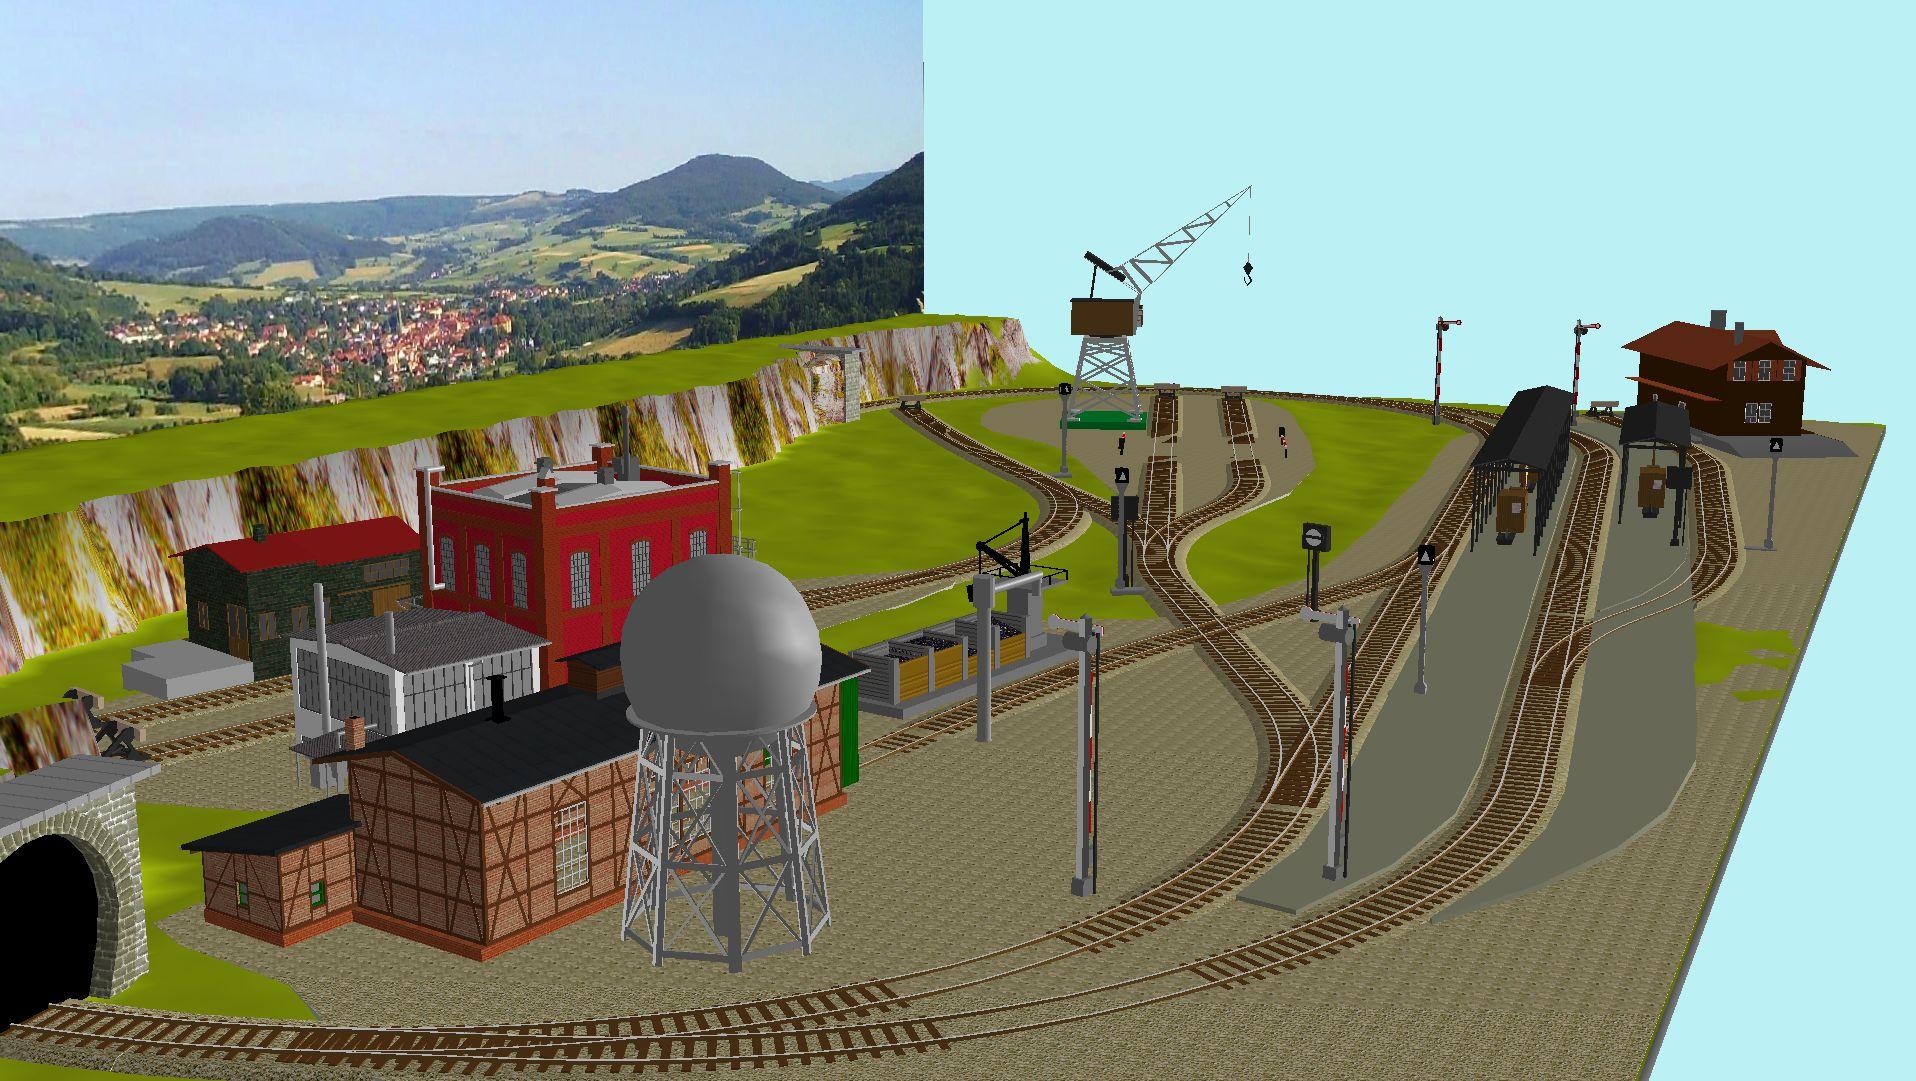 'ALBA Modellbahnpraxis' Band 1, Plan 5 Amp-1_5_m-gleis_jrg_3jkkfp